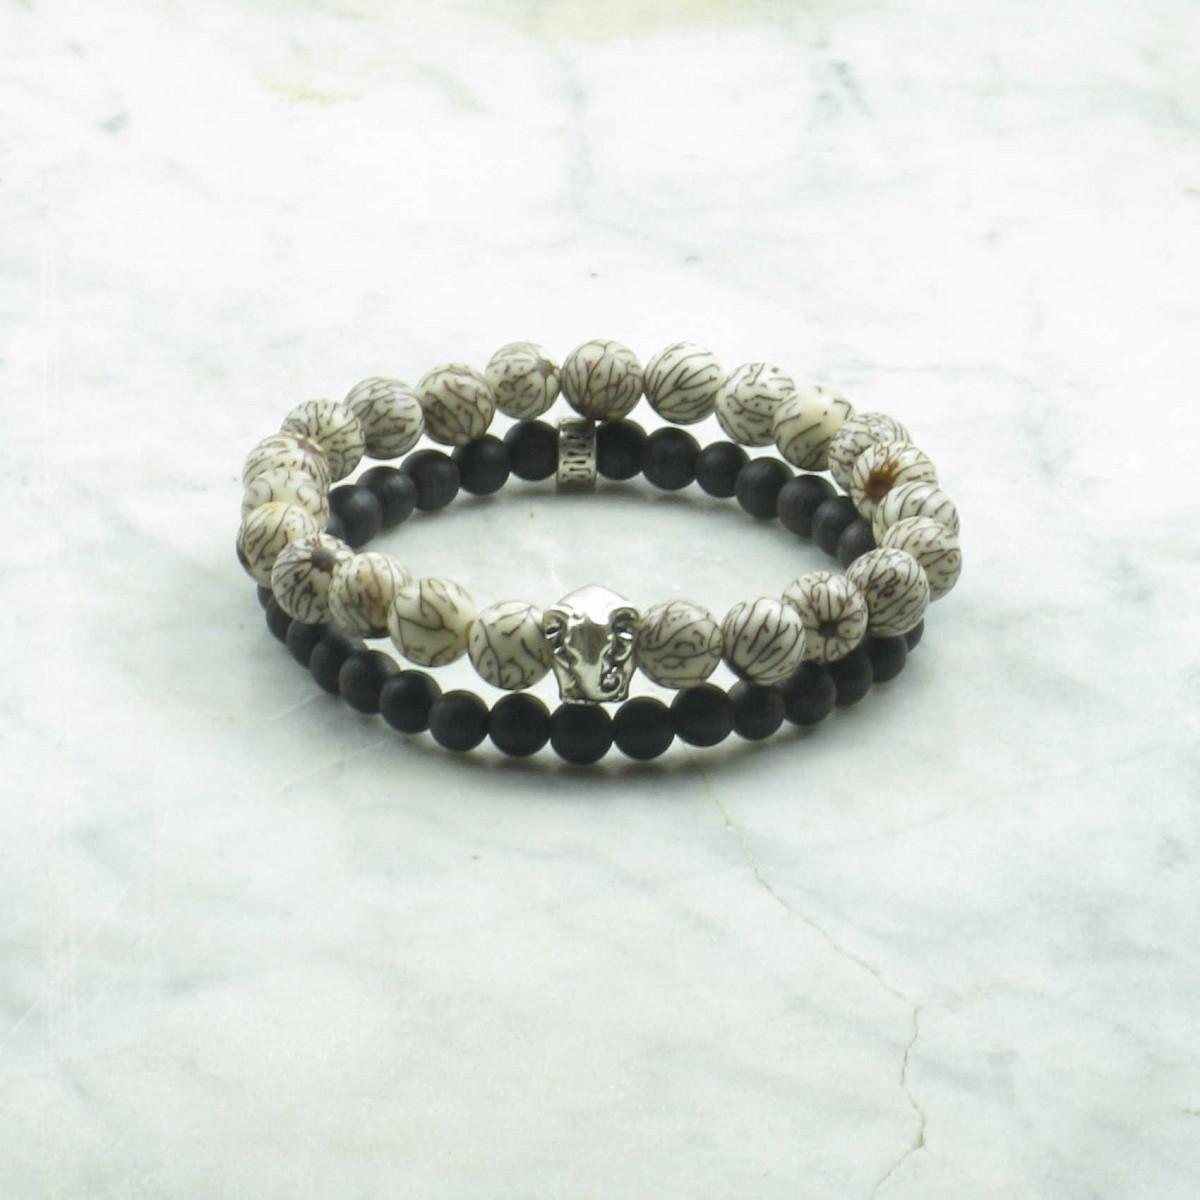 Mindful_Bracelets_for_Men_Mala_Beads_Stacks_Bodhi_Agarwood_Buddhist_Prayer_Beads